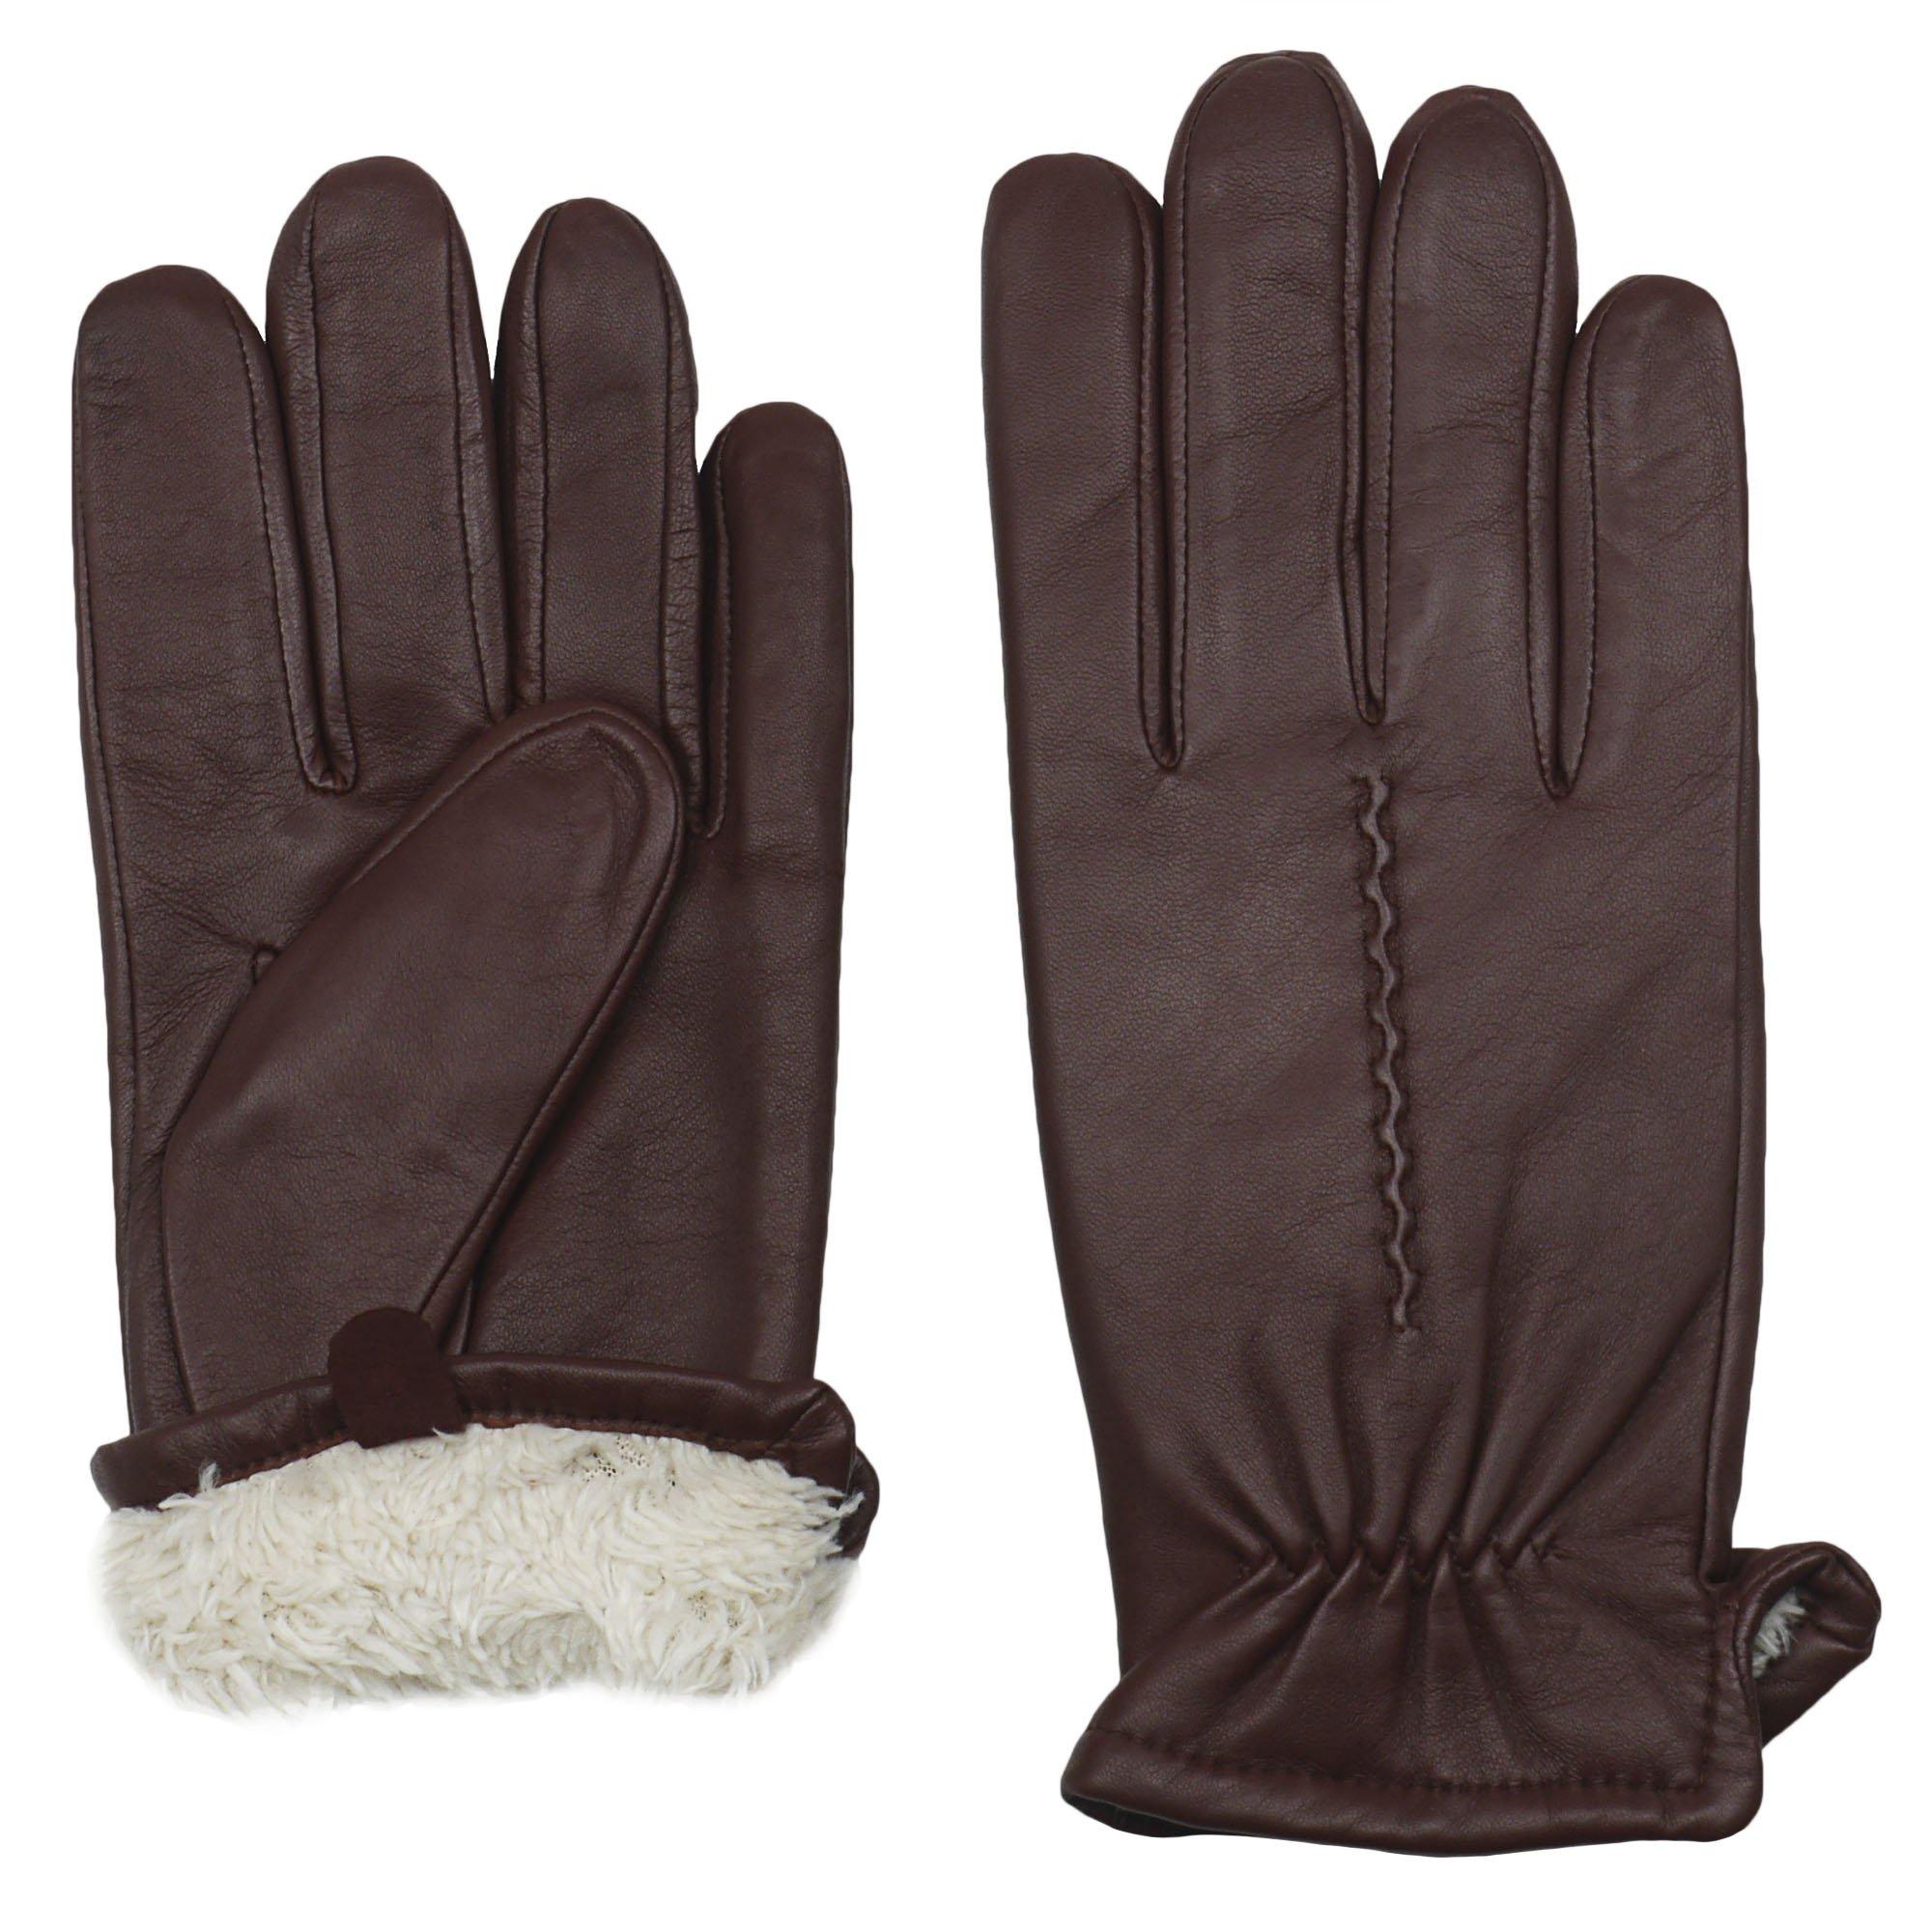 GRANDOE Men's CLYDE Premium 100% Sheepskin Leather Glove (Copper, Large)